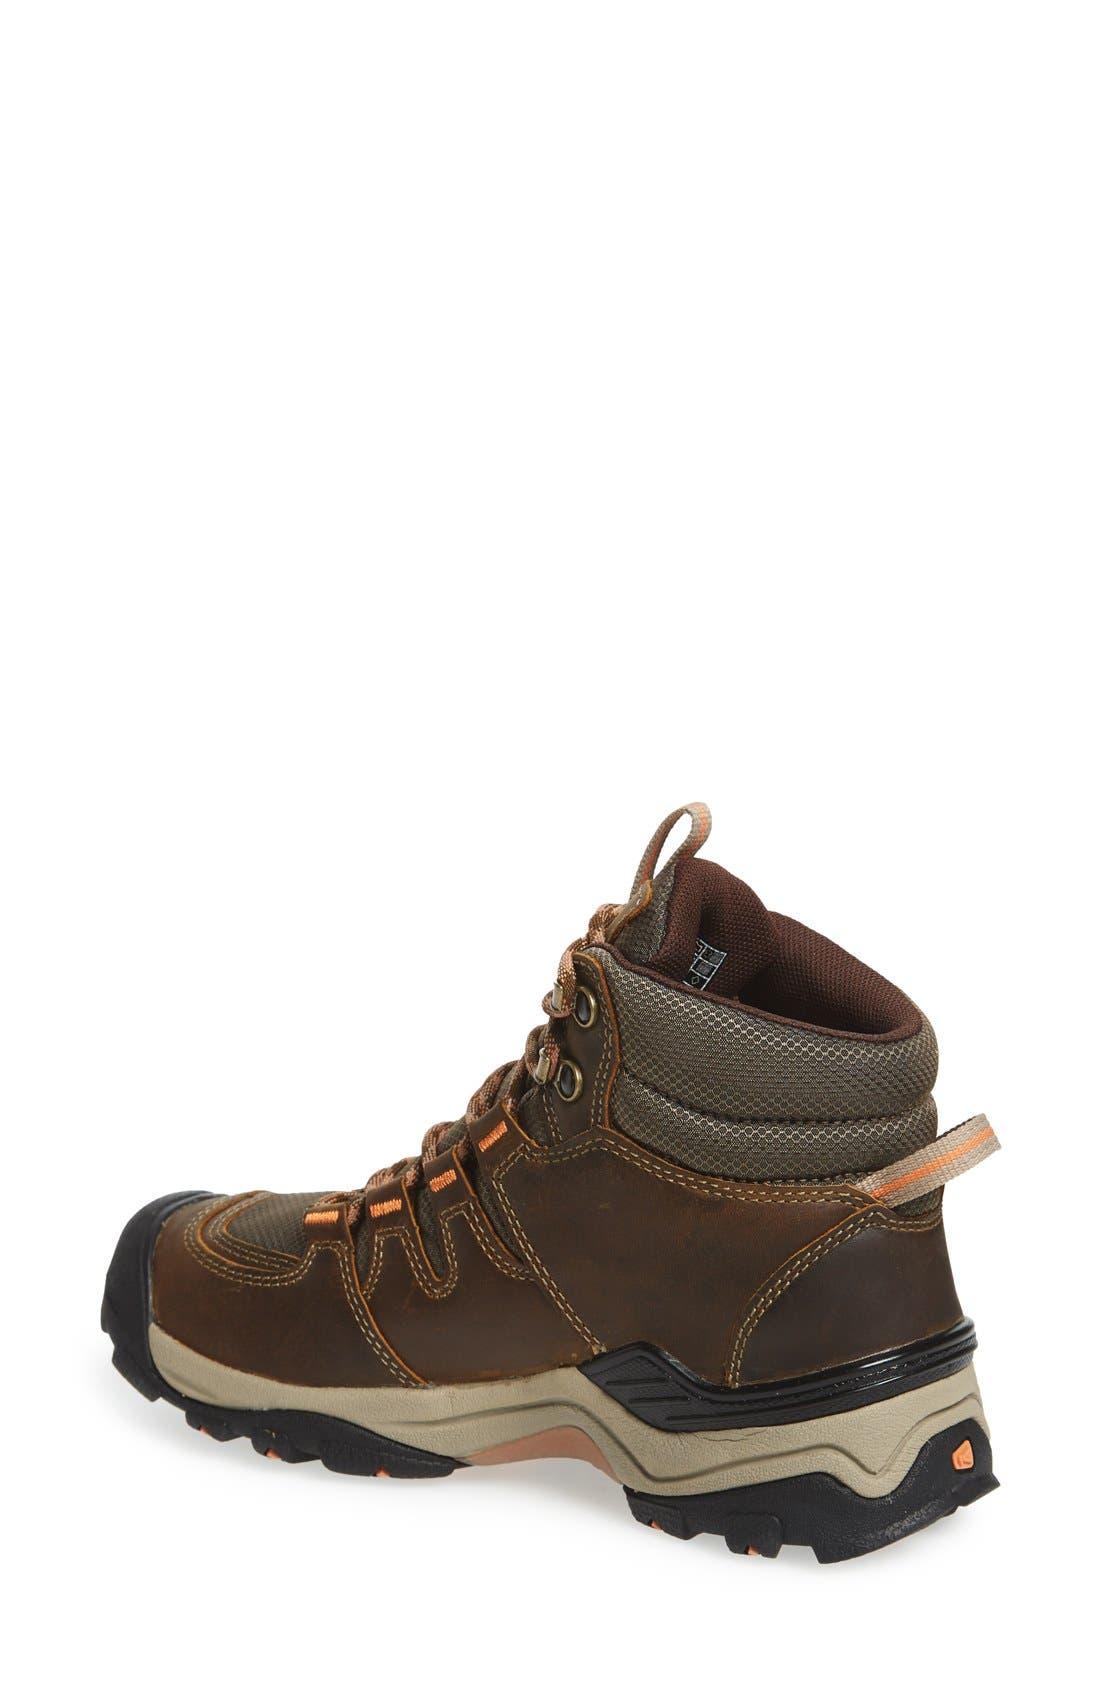 Gypsum II Mid Waterproof Hiking Boot,                             Alternate thumbnail 2, color,                             200